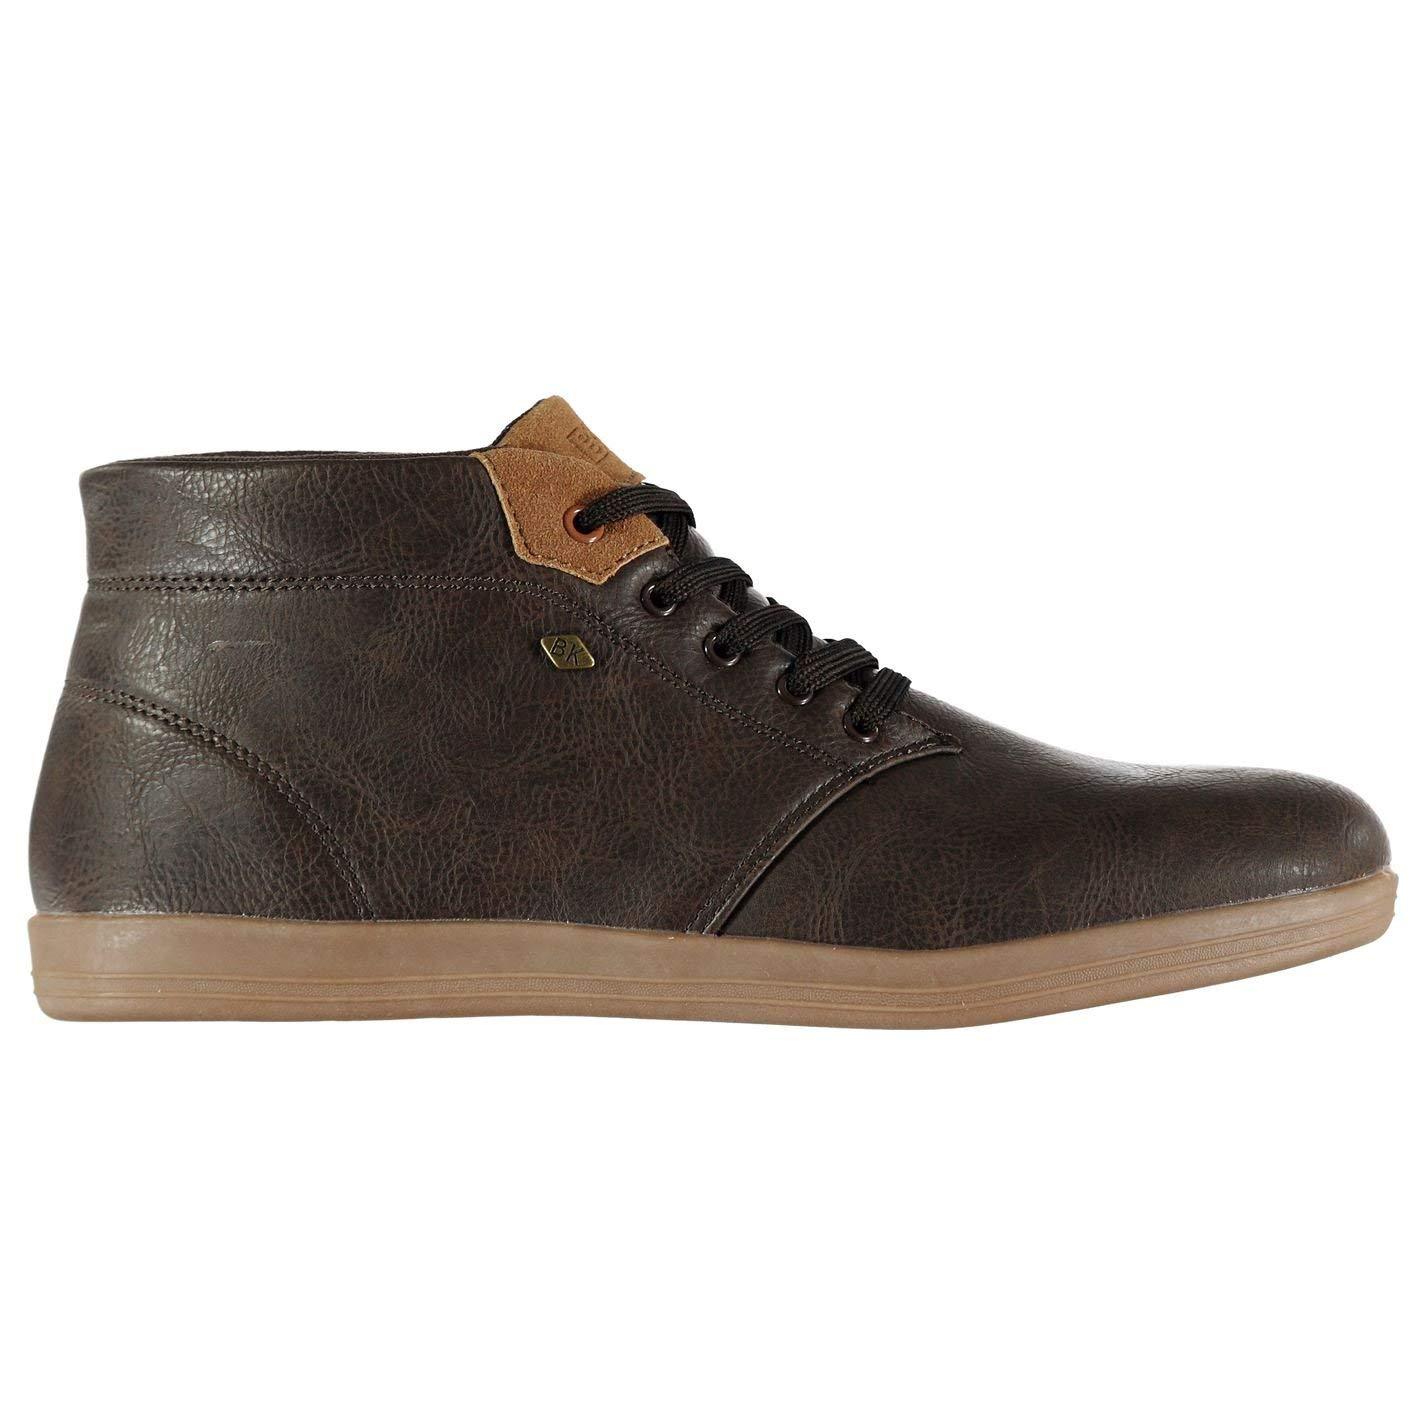 Cheap Lee Cooper Shoes Mens, find Lee